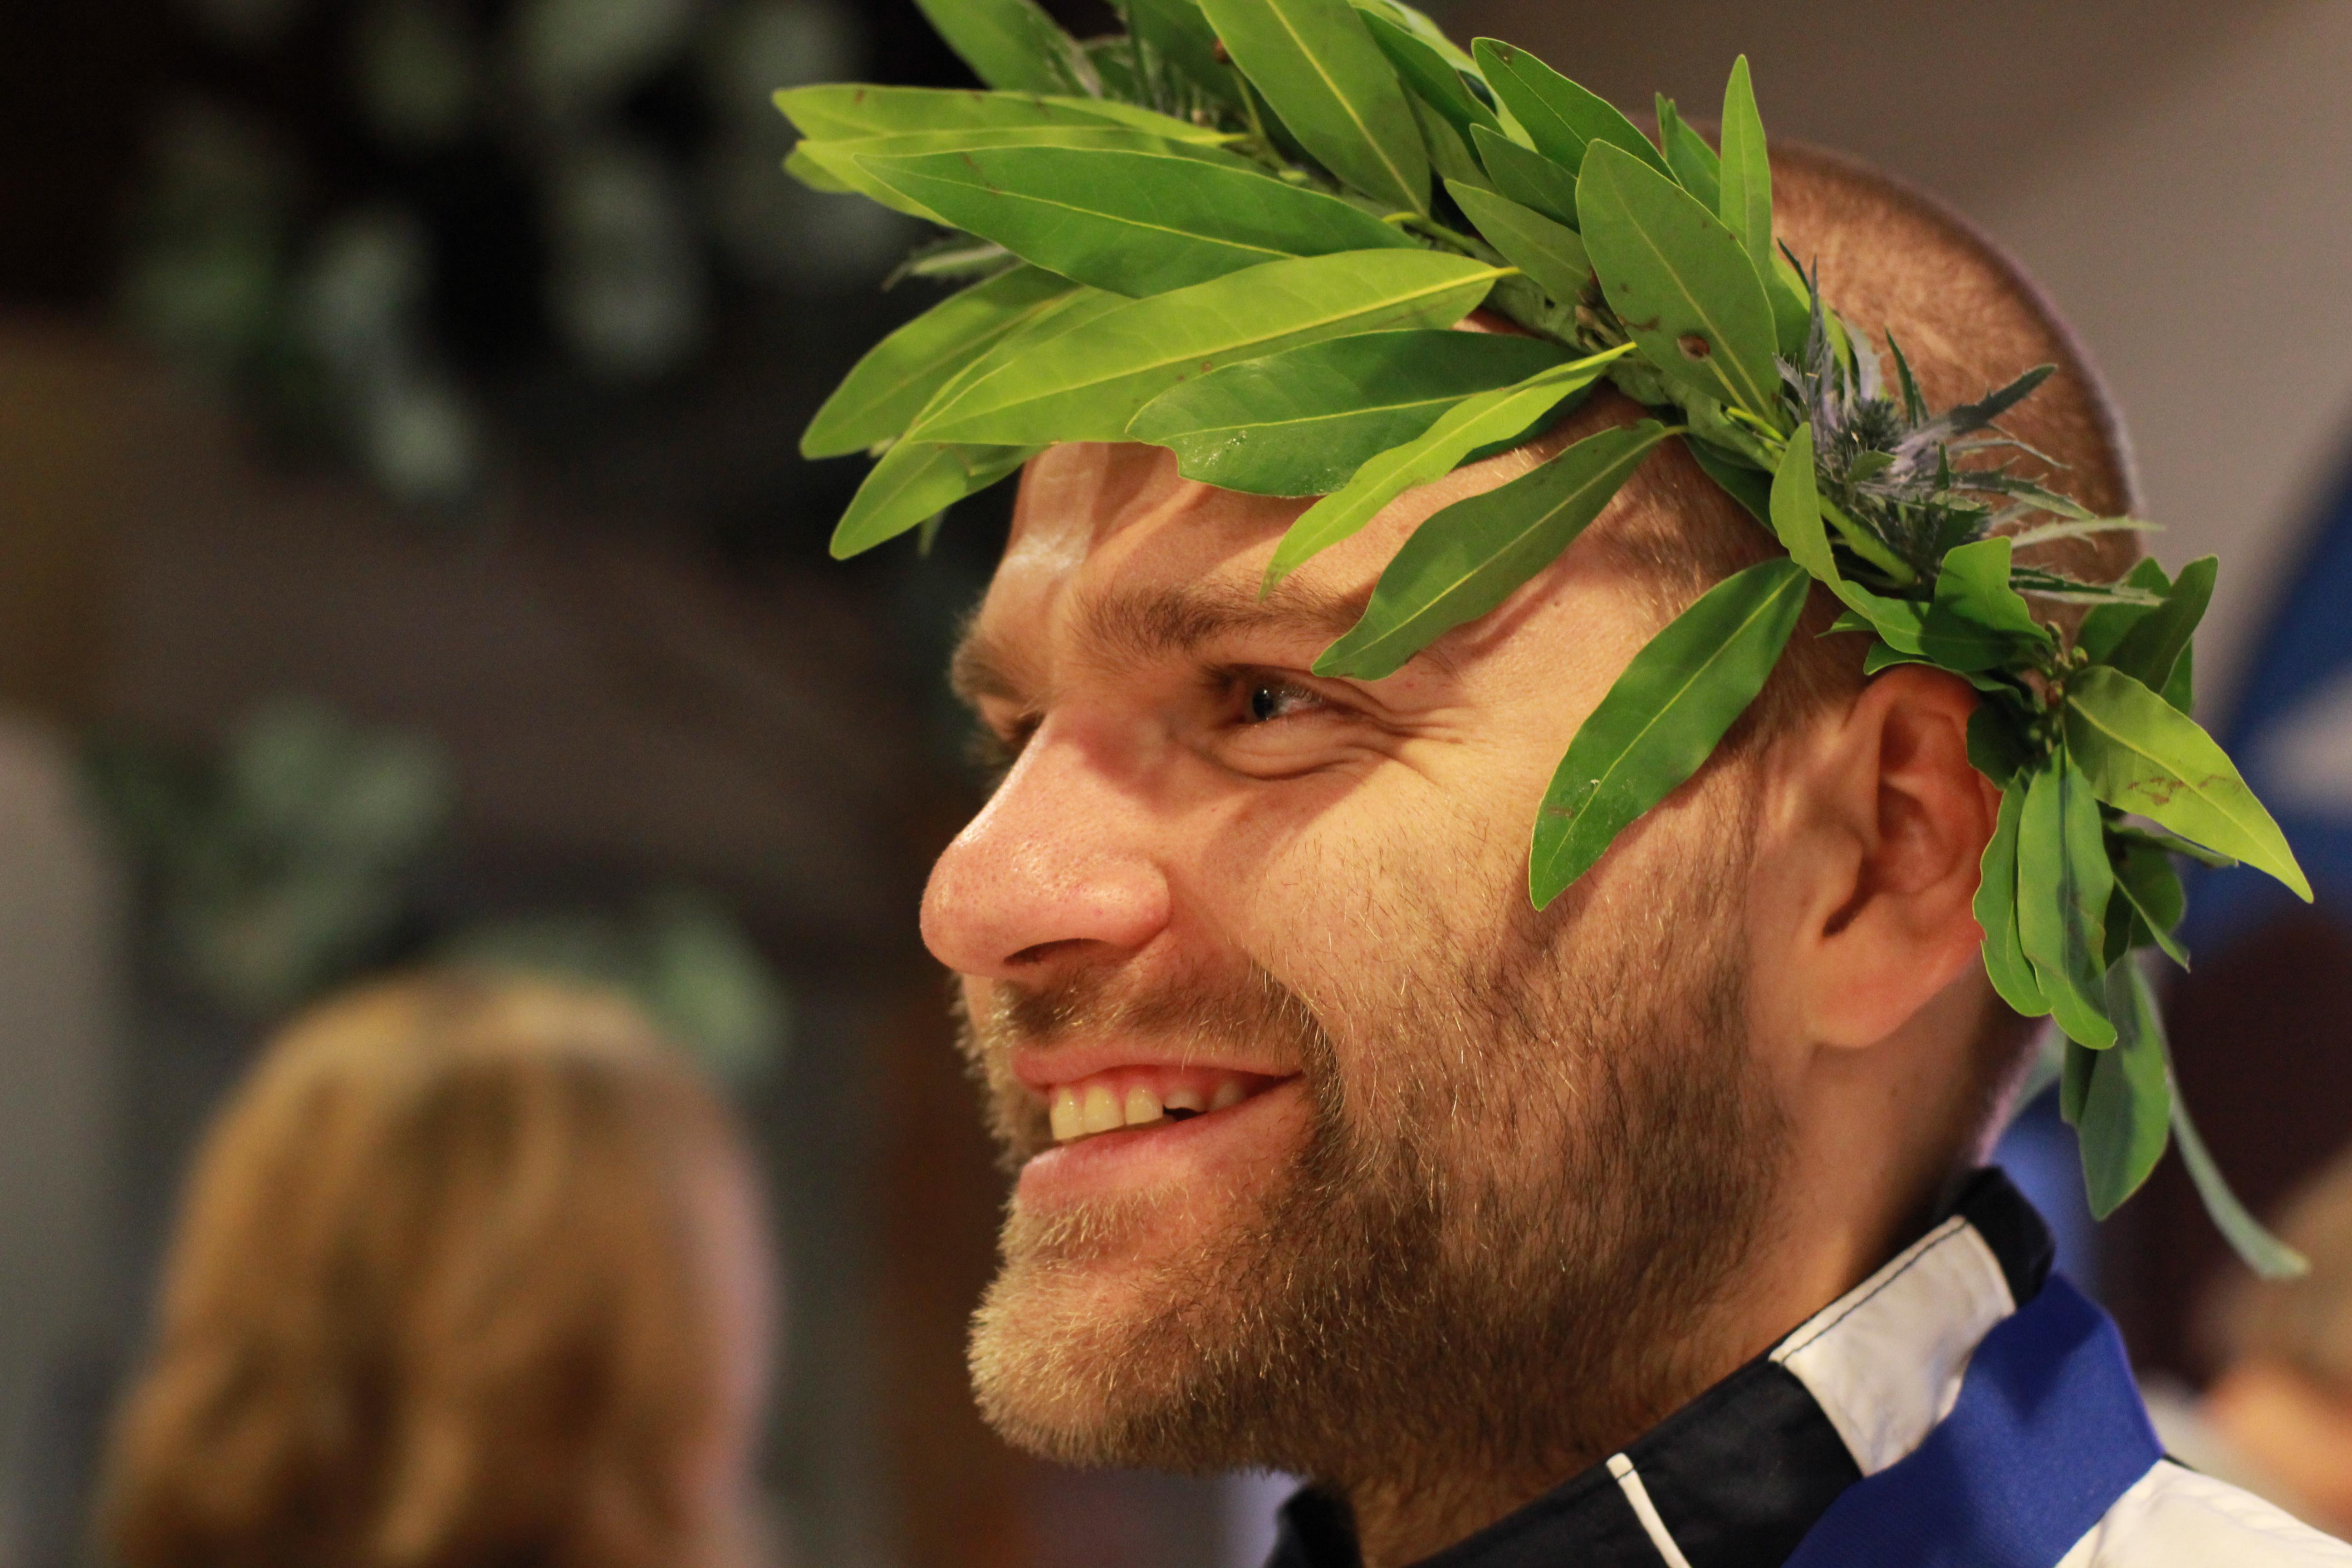 Head Wreath Greek Wearing a Head Wreath i